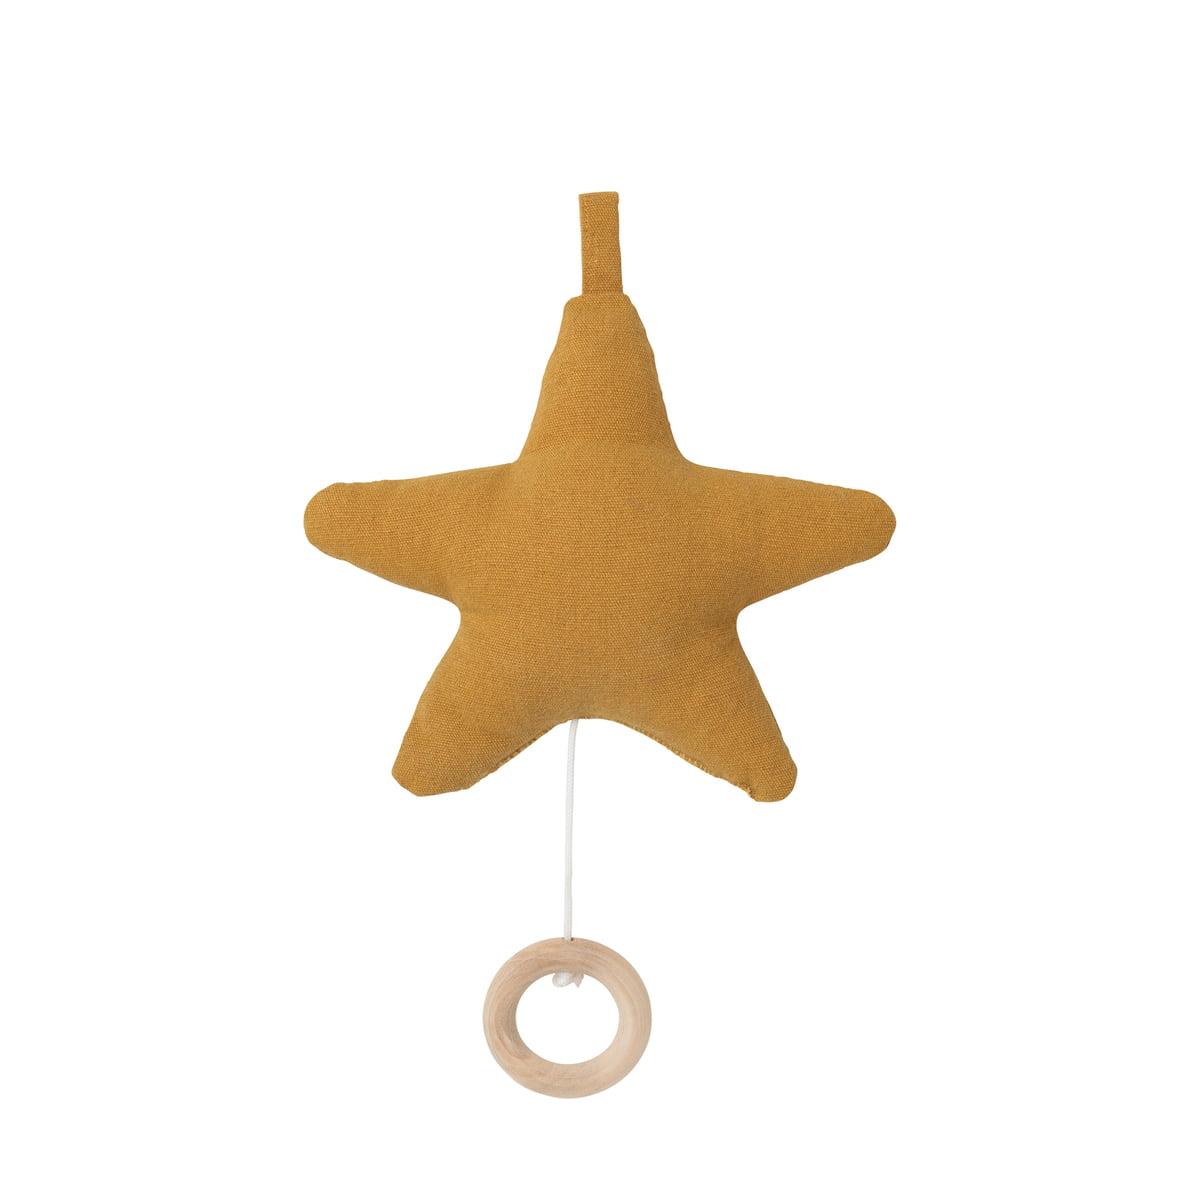 ferm Living - Star Spieluhr, senf   Kinderzimmer > Spielzeuge   Senfgelb   Bezug: 100% baumwolle -  füllung: polyester   ferm living